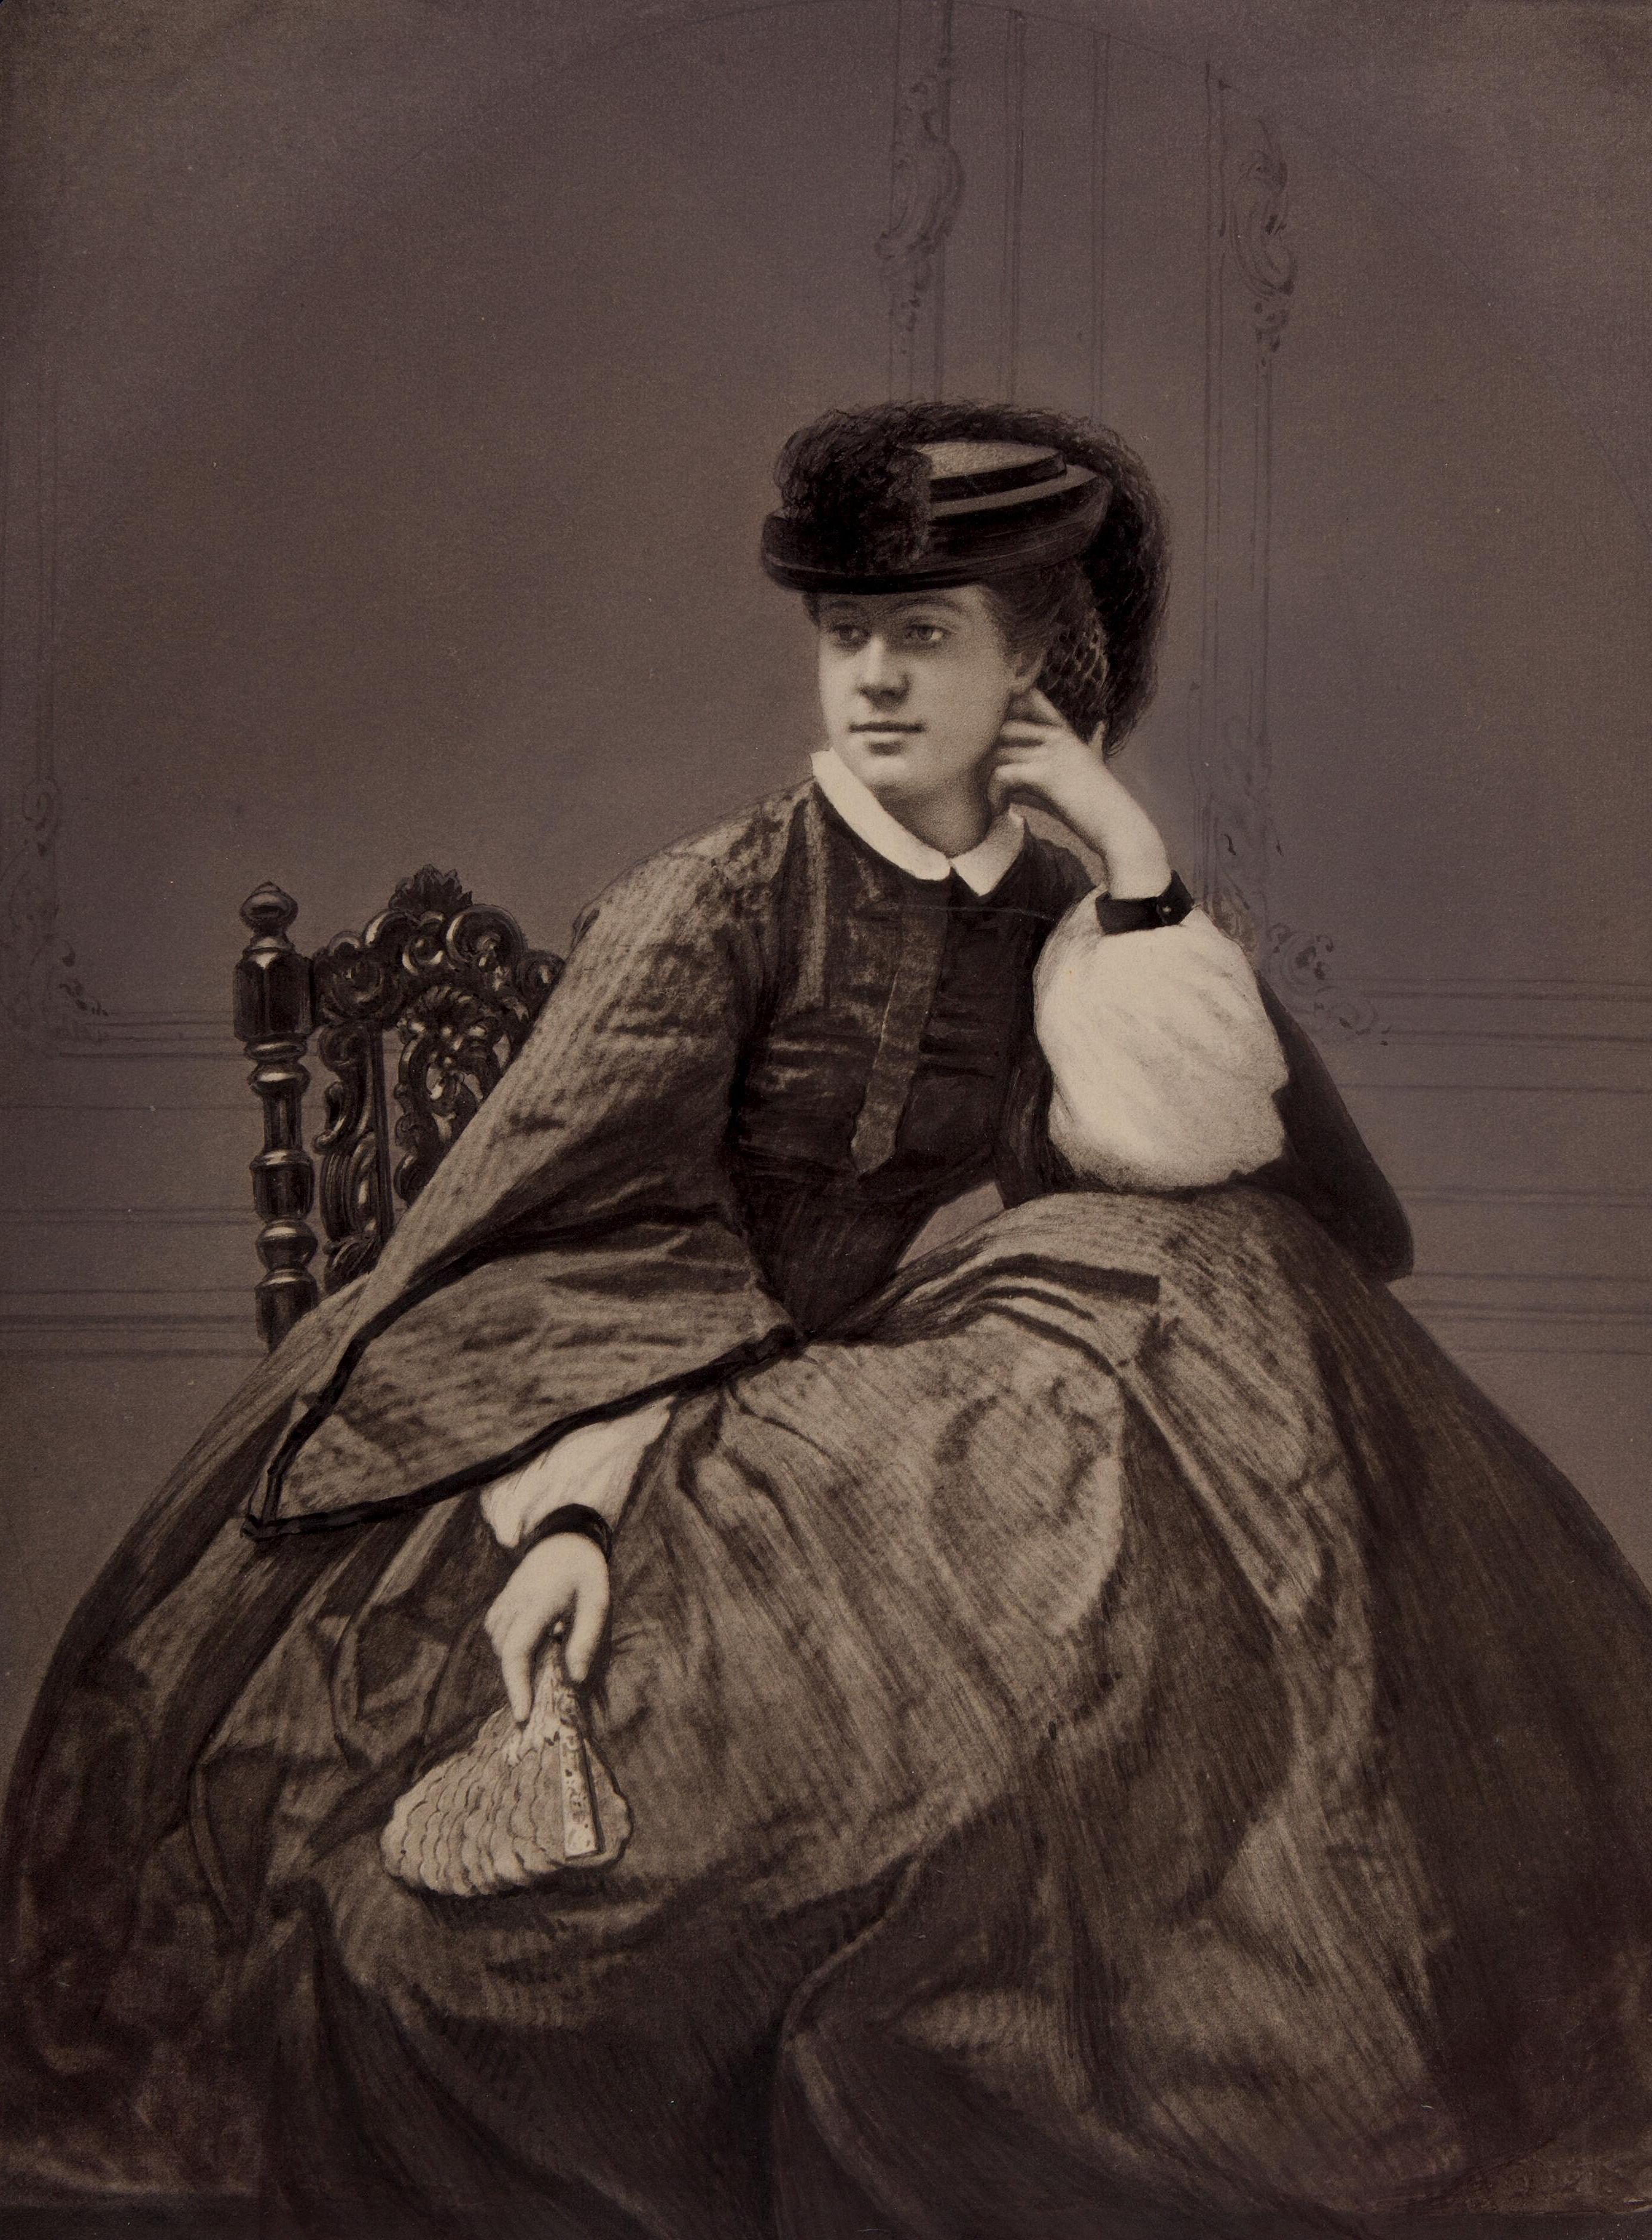 Image of Alexandrine Tinne from Wikidata